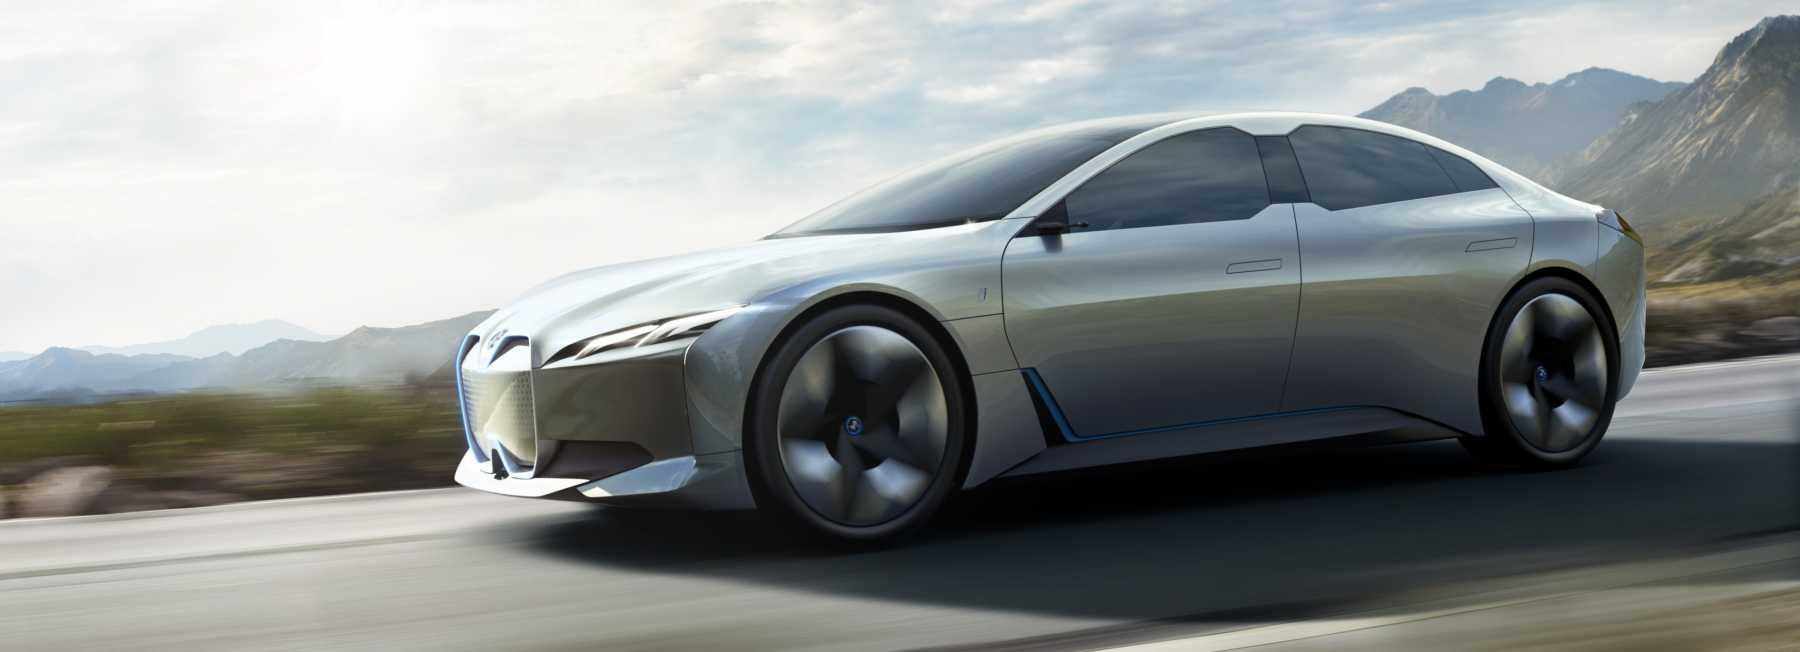 BMW i4 Concept image front 2